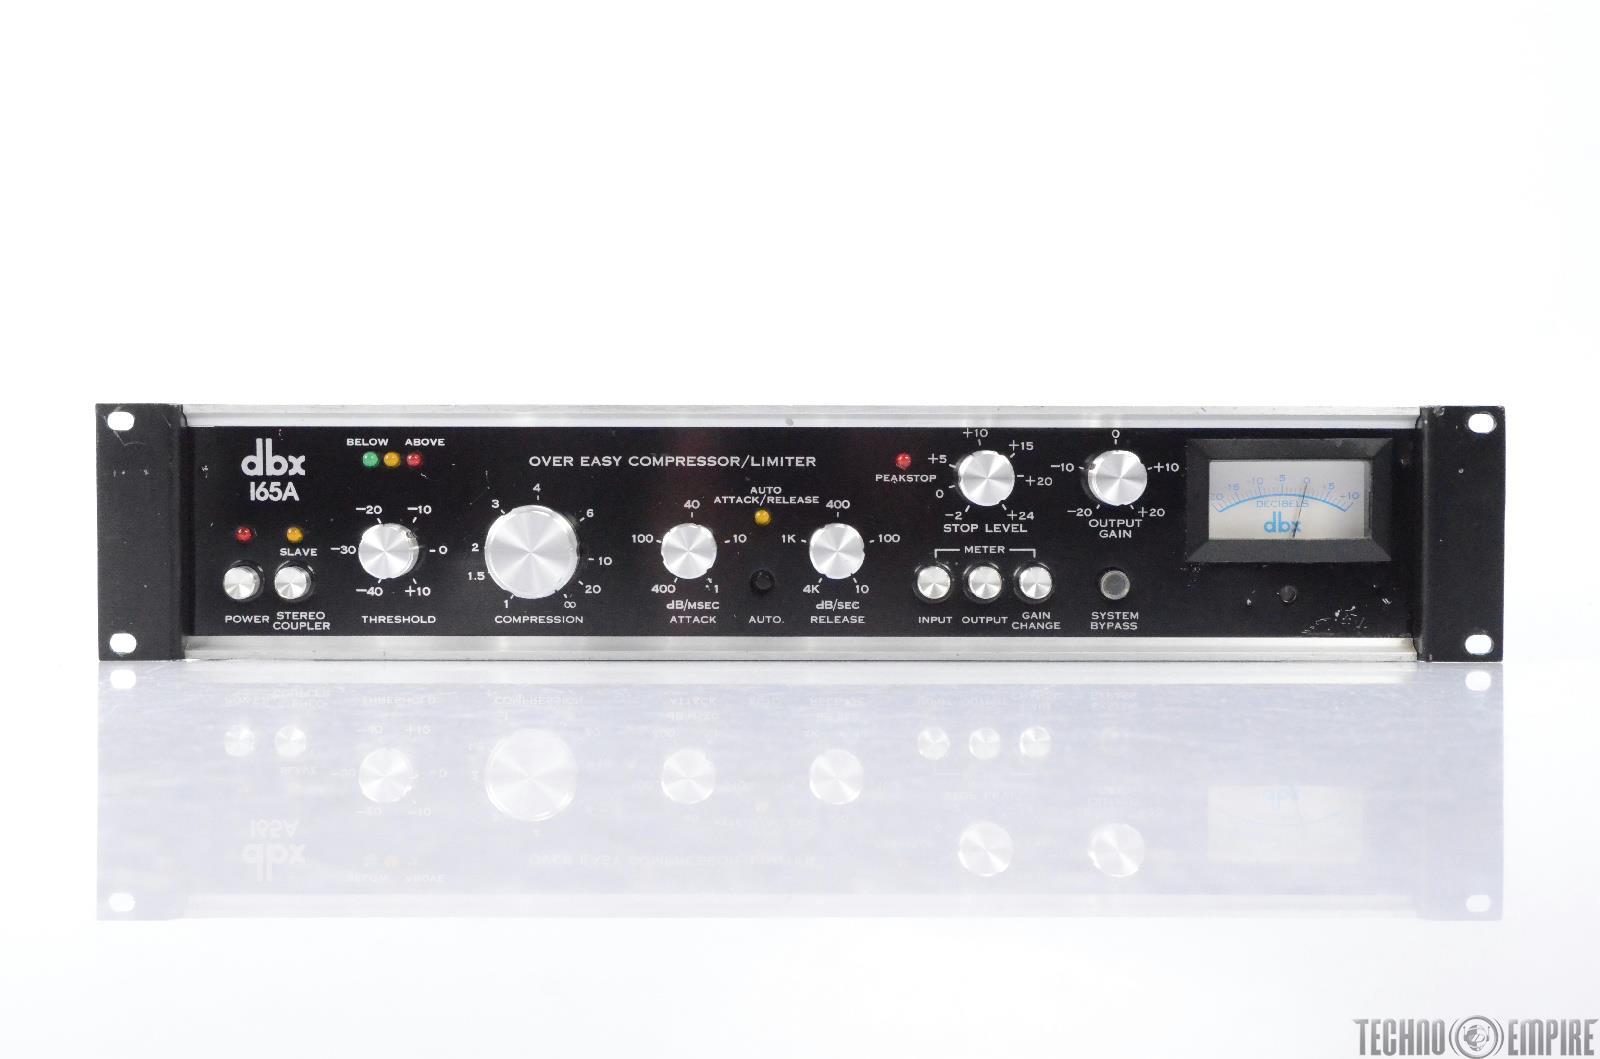 DBX 165A Over Easy Compressor Limiter Fairfax Recordings #28647